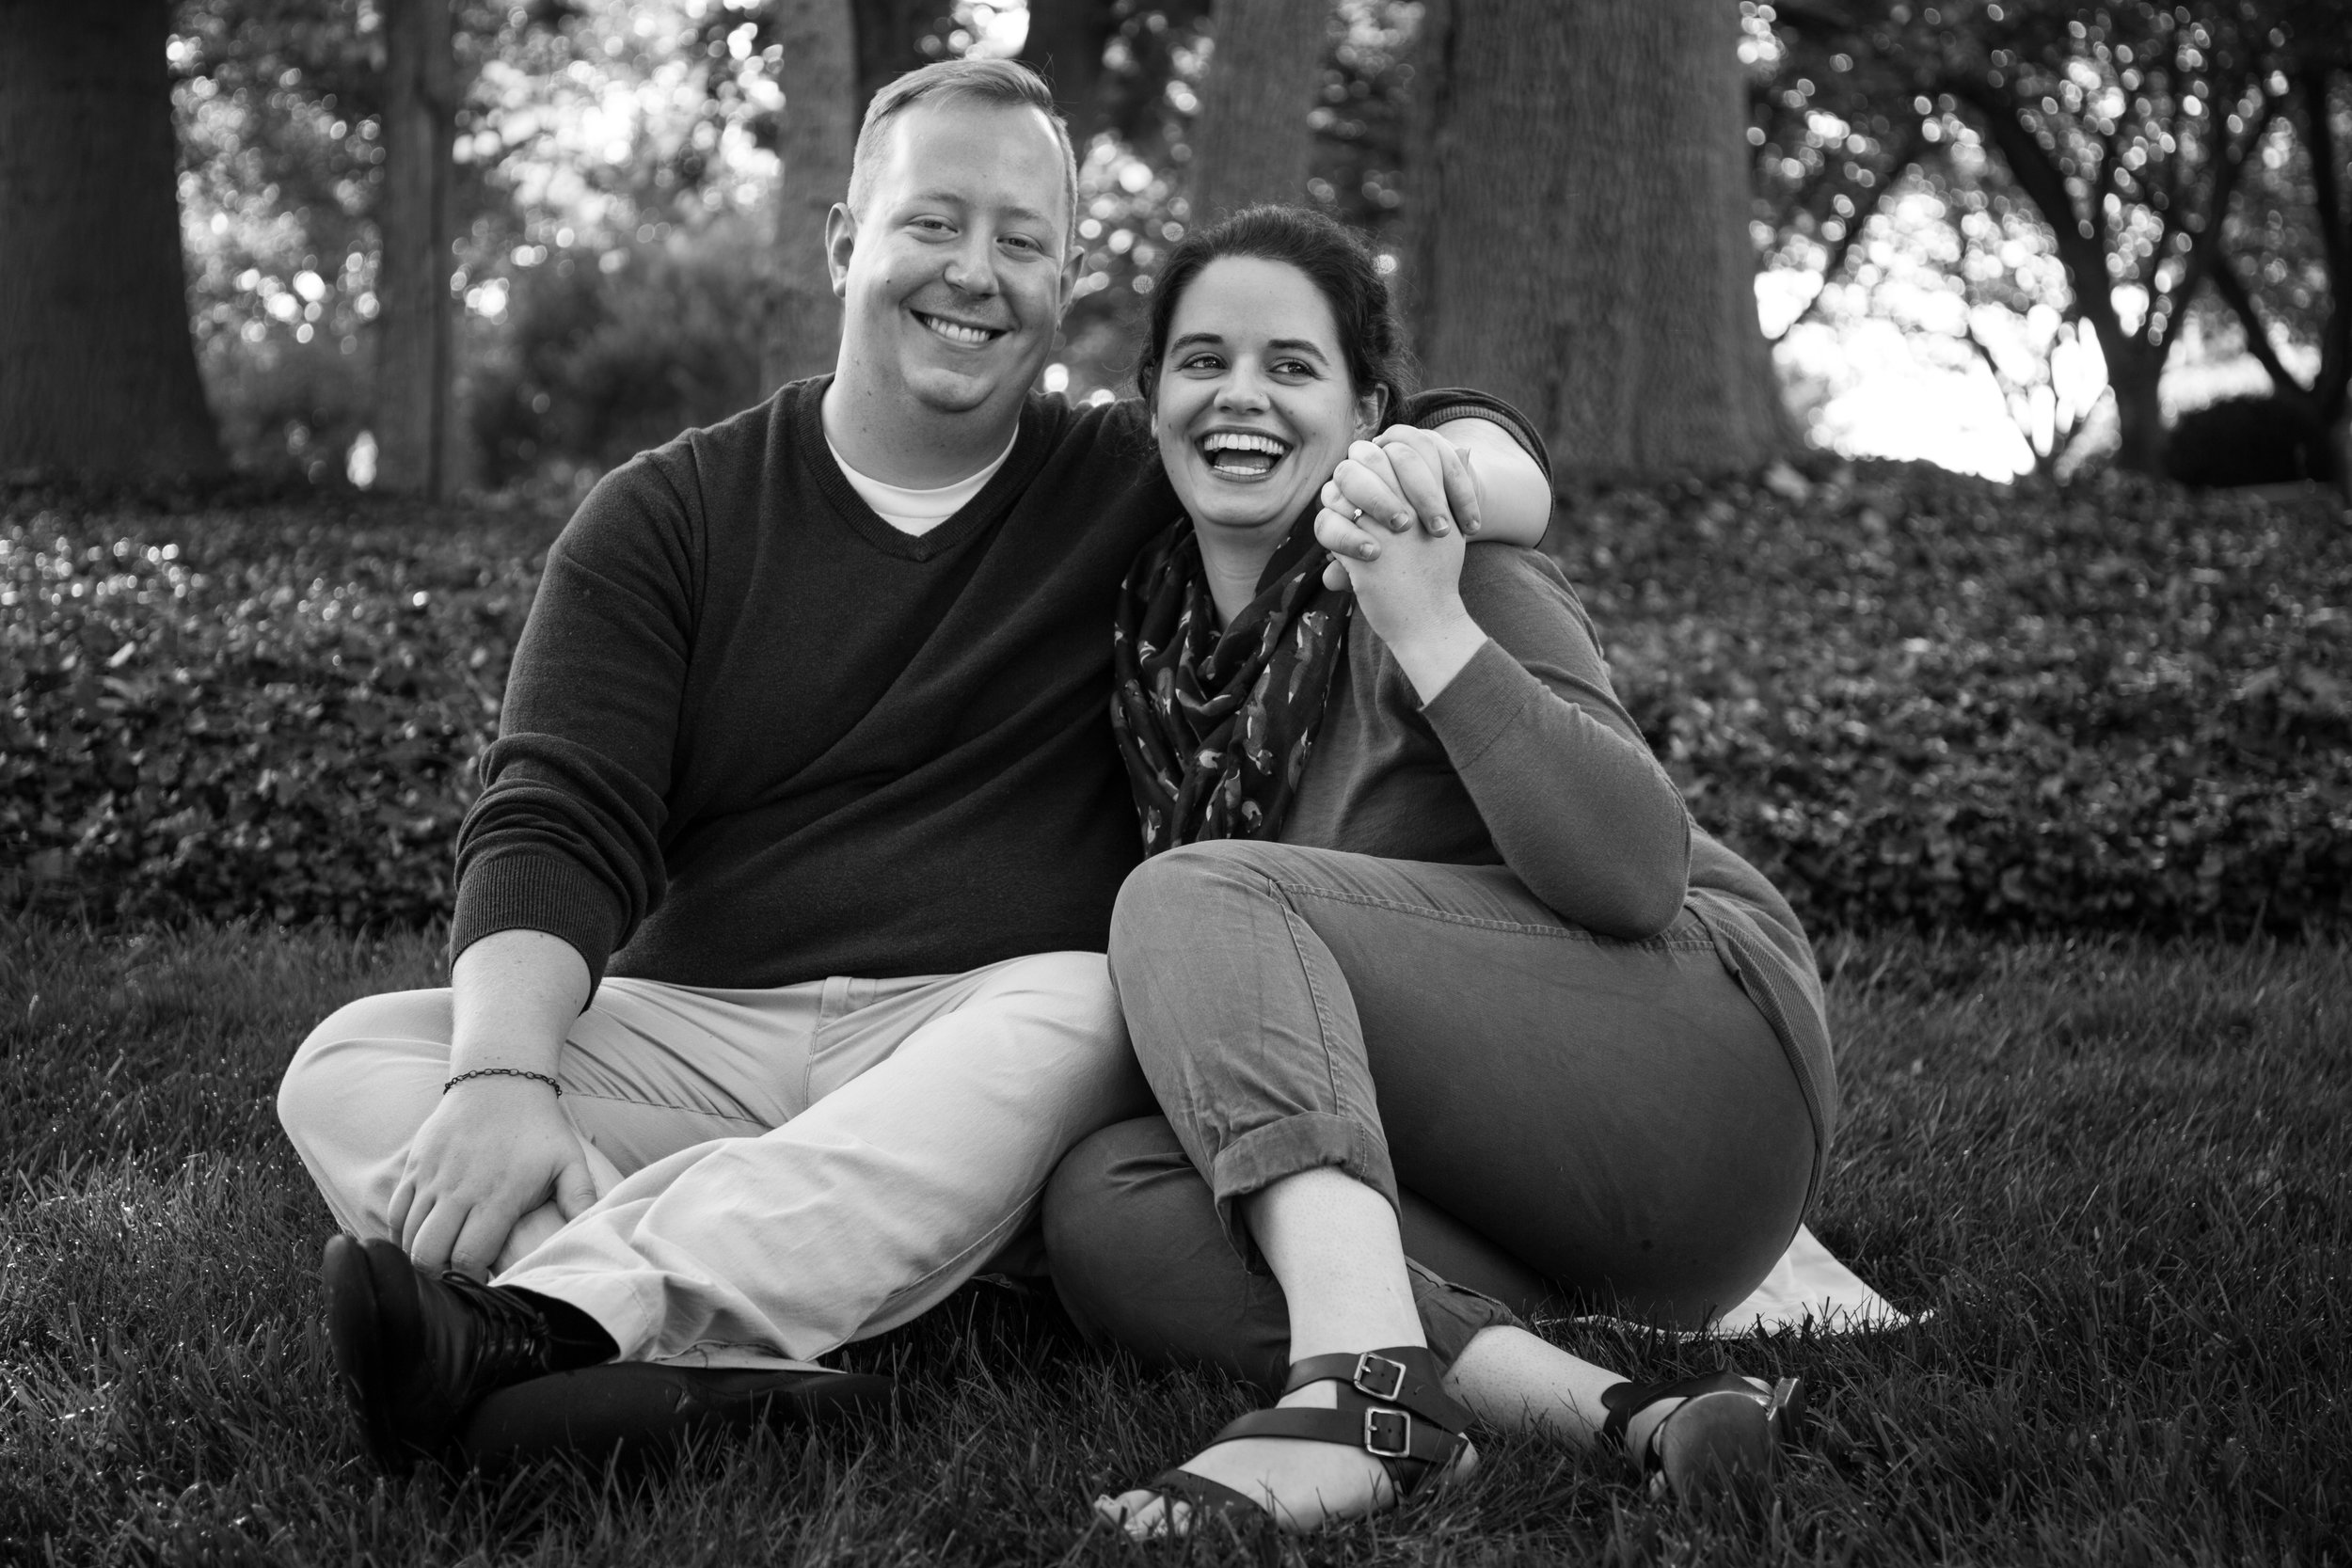 Phil and Becca-5385-2.jpg